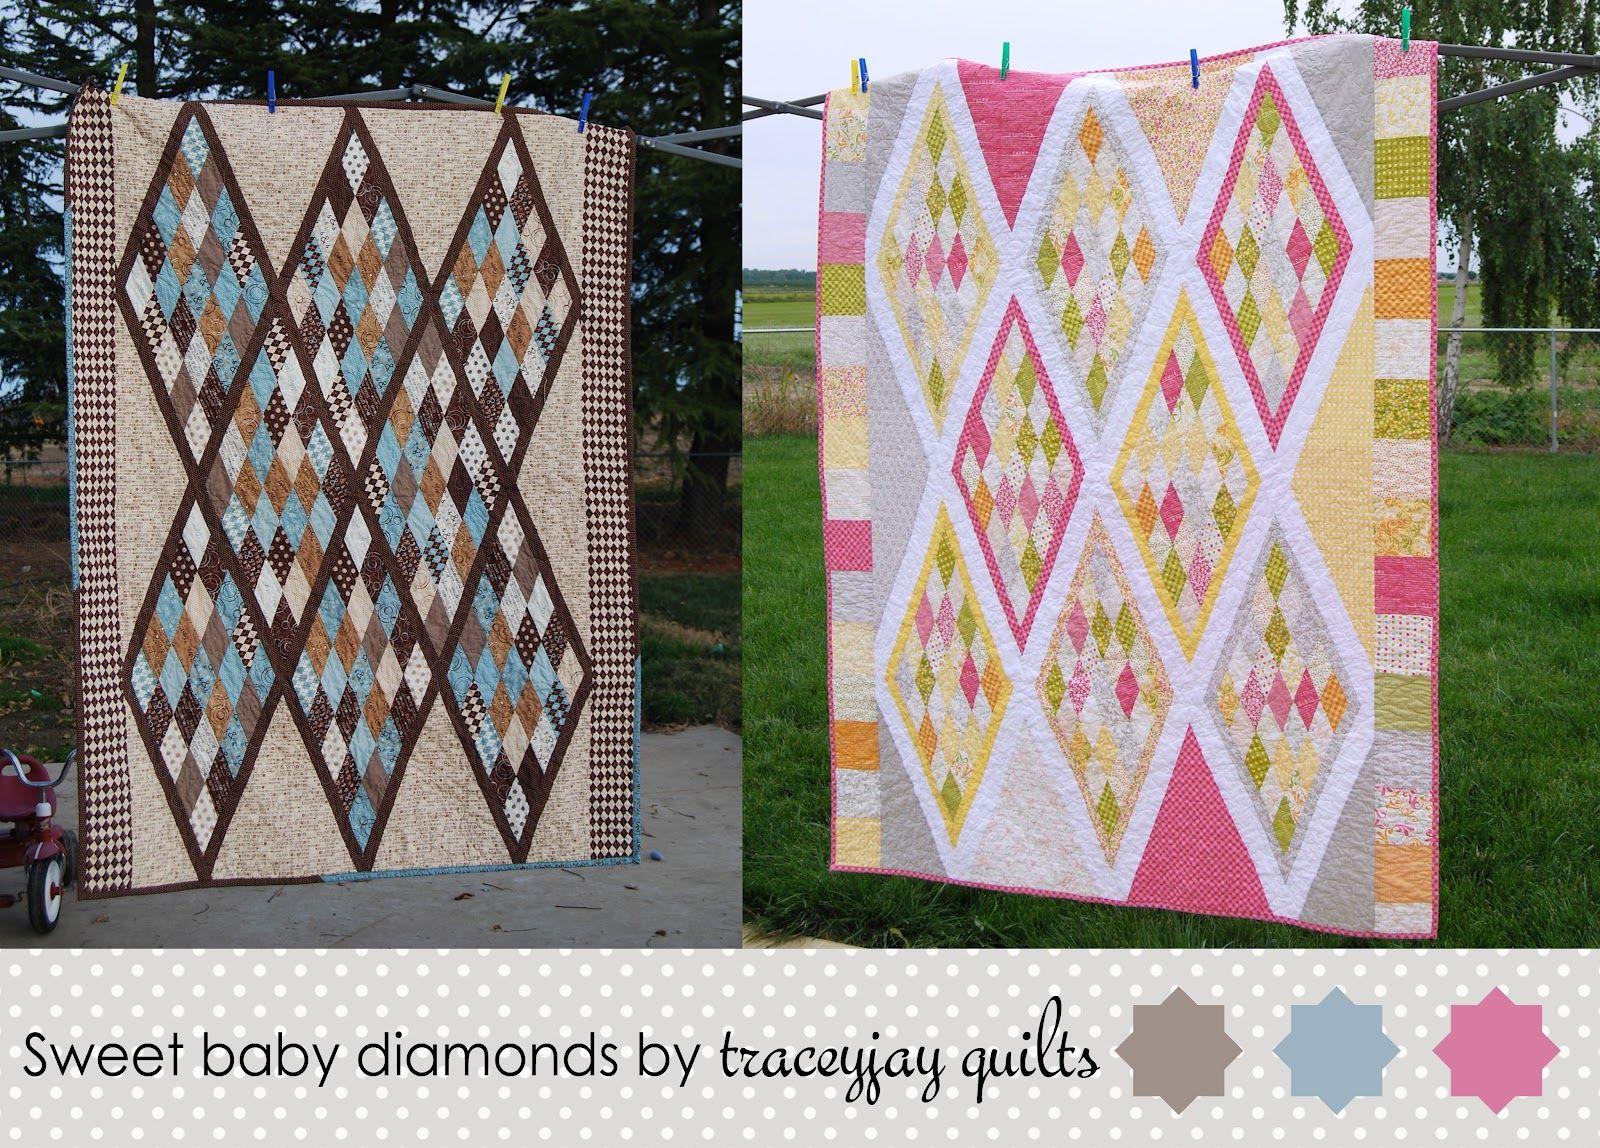 Moda Bake Shop: Sweet Baby Diamonds Quilt